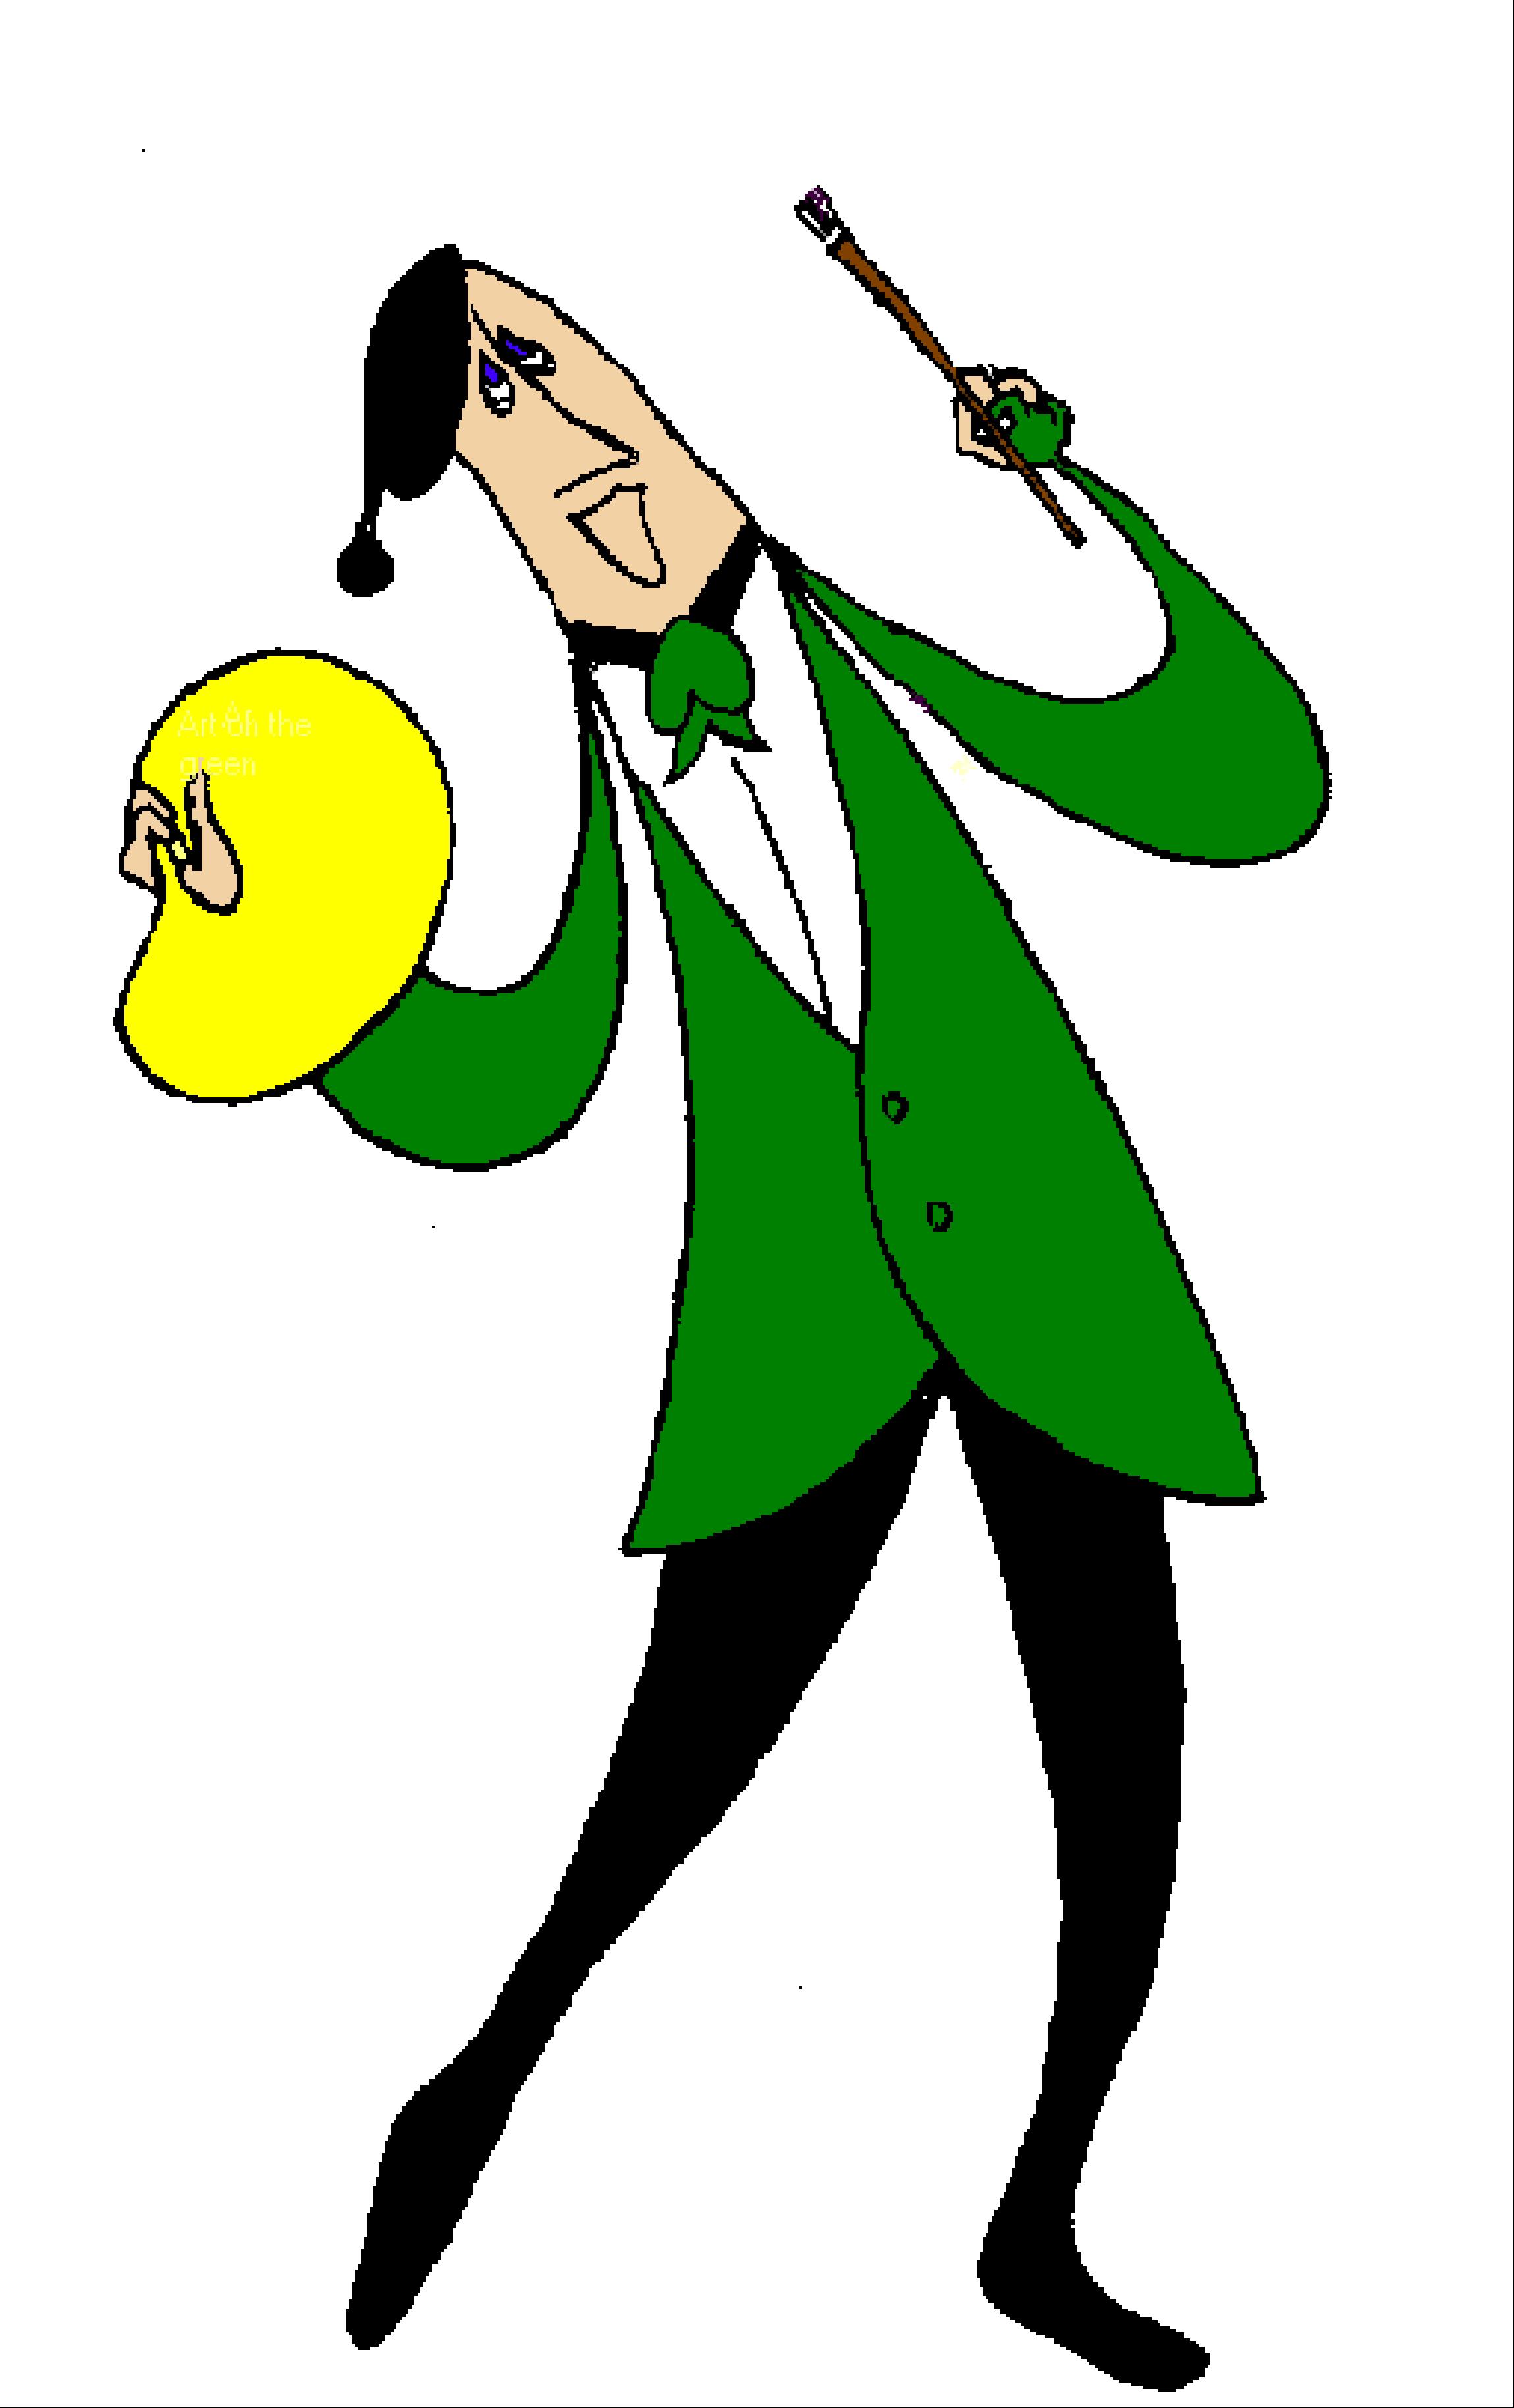 Art on the Green Man Logo